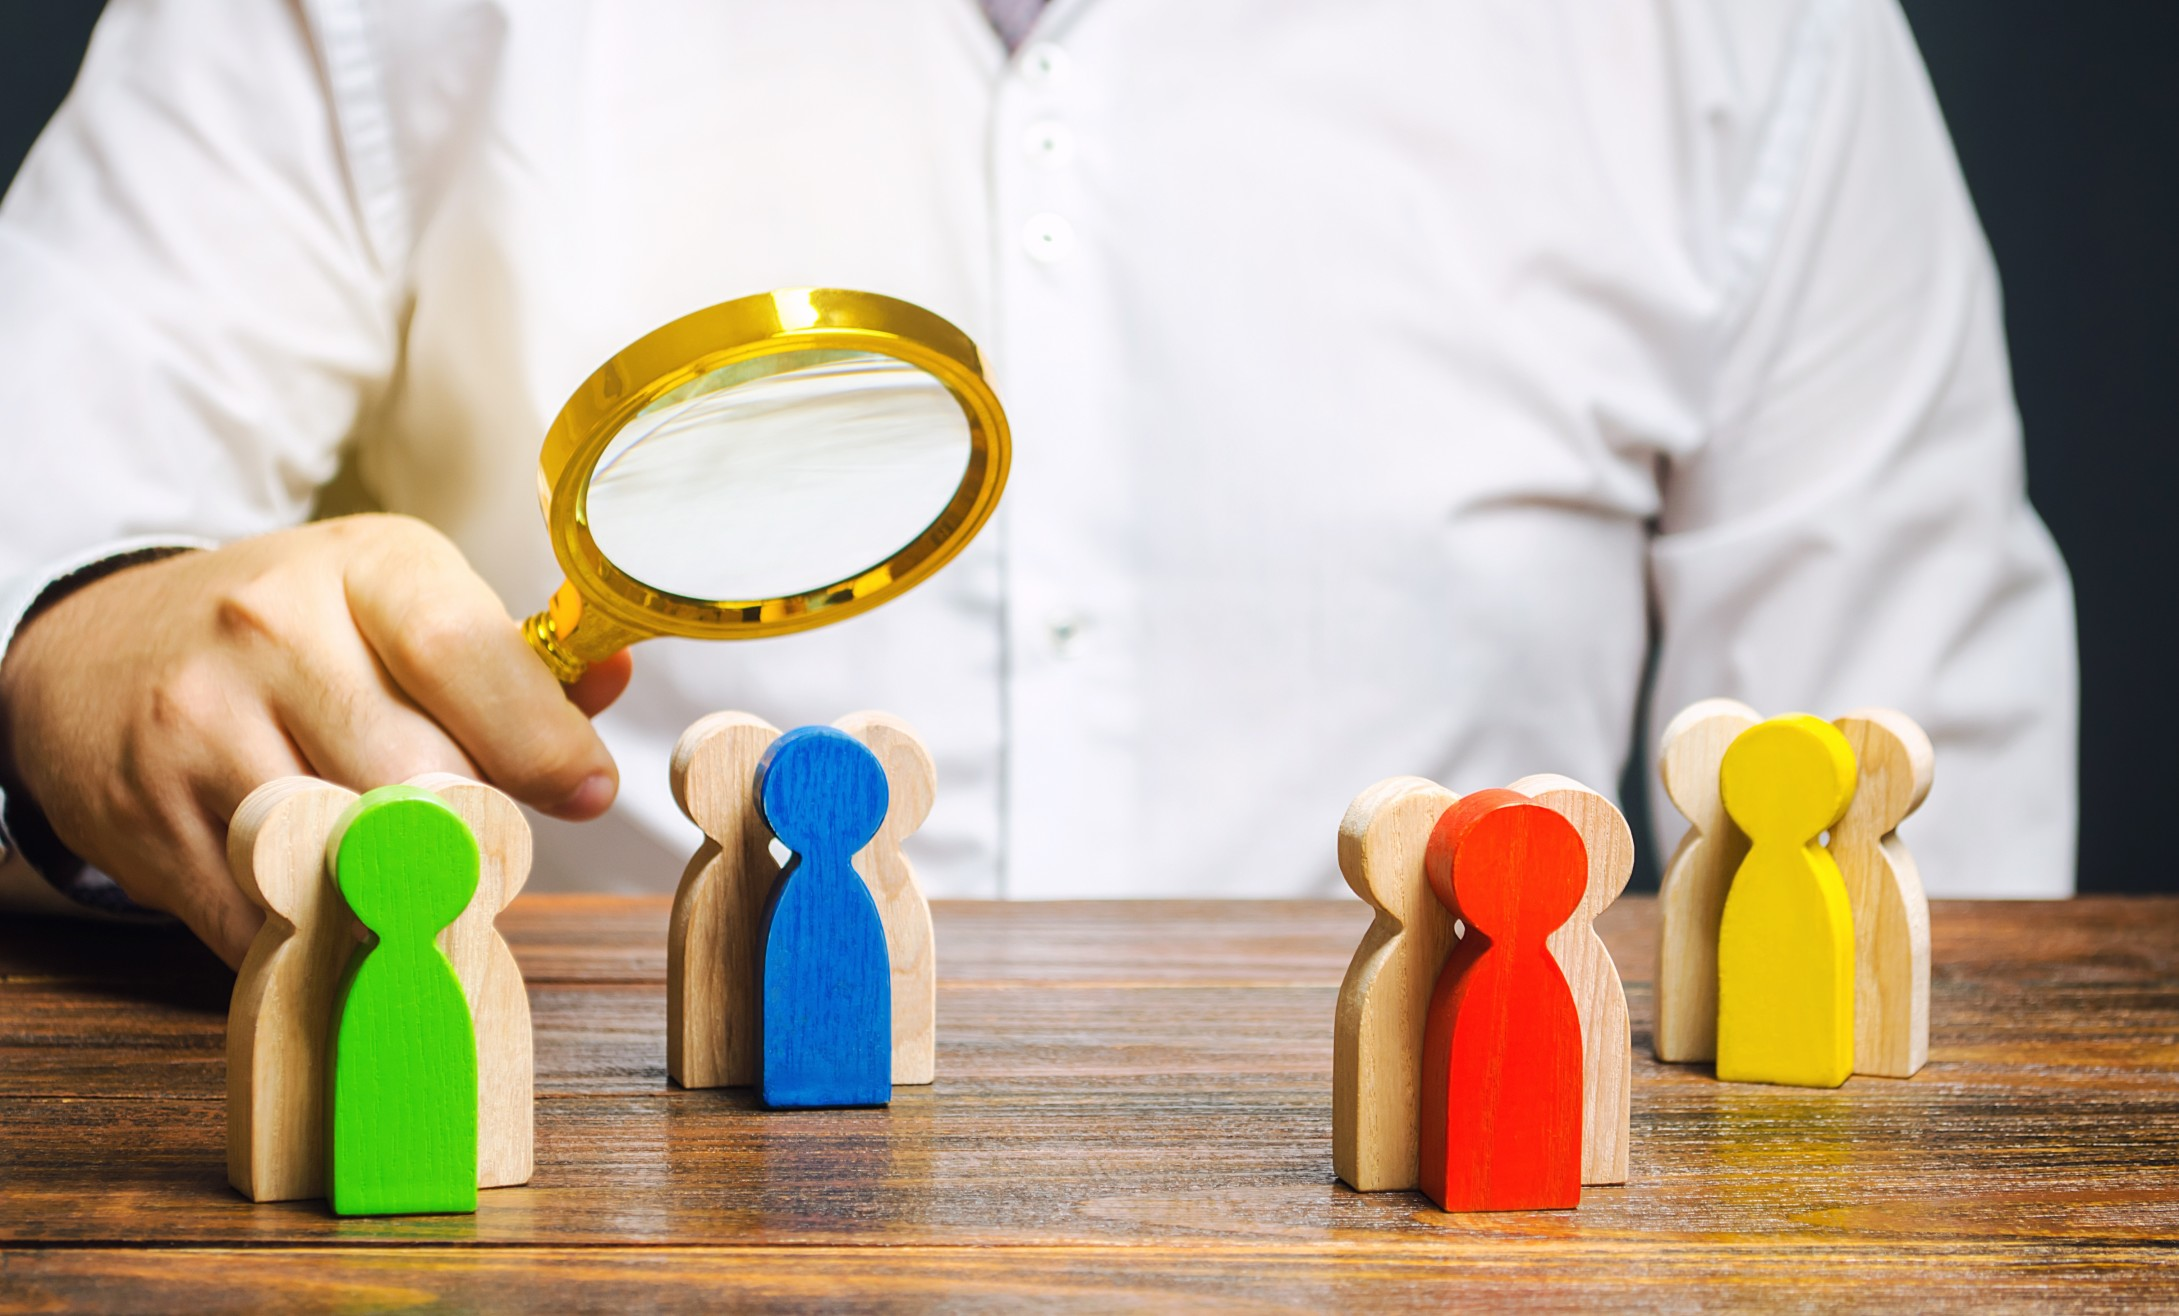 market-segmentation-marketing-groups-segment-classification-segments-analysis-audience-business_t20_0x3glo